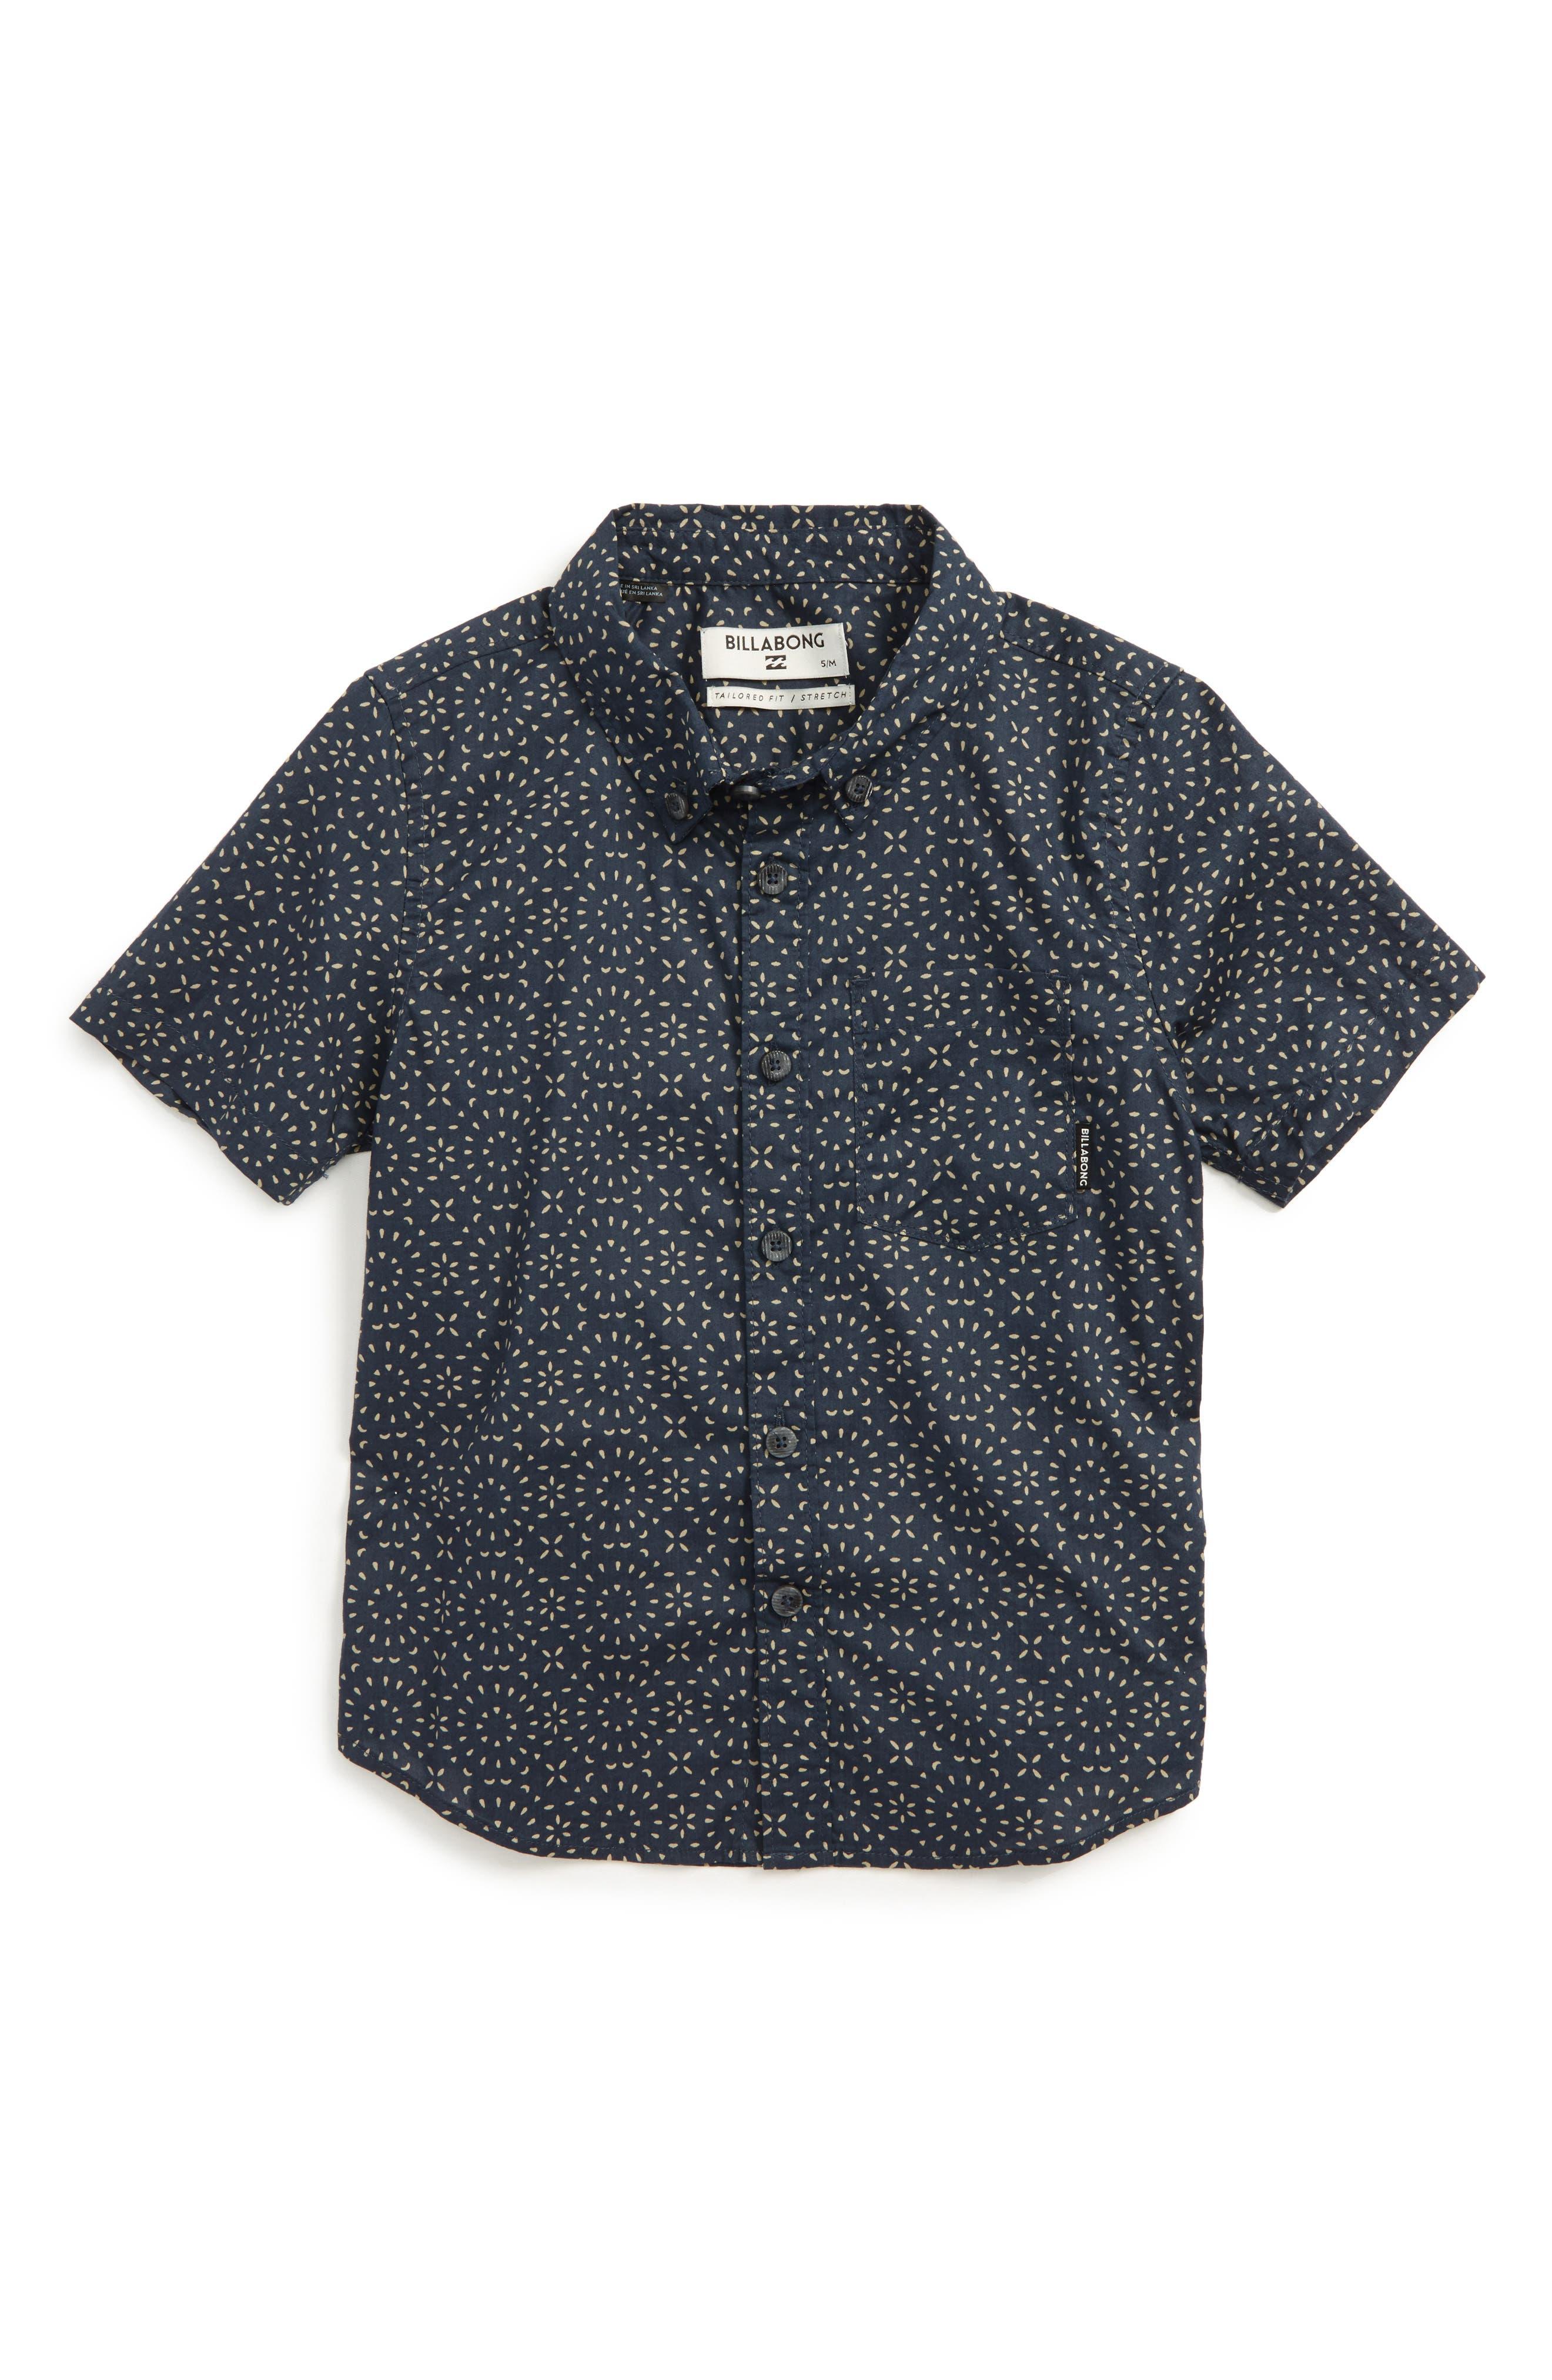 Billabong Sundays Mini Woven Shirt (Toddler Boys)